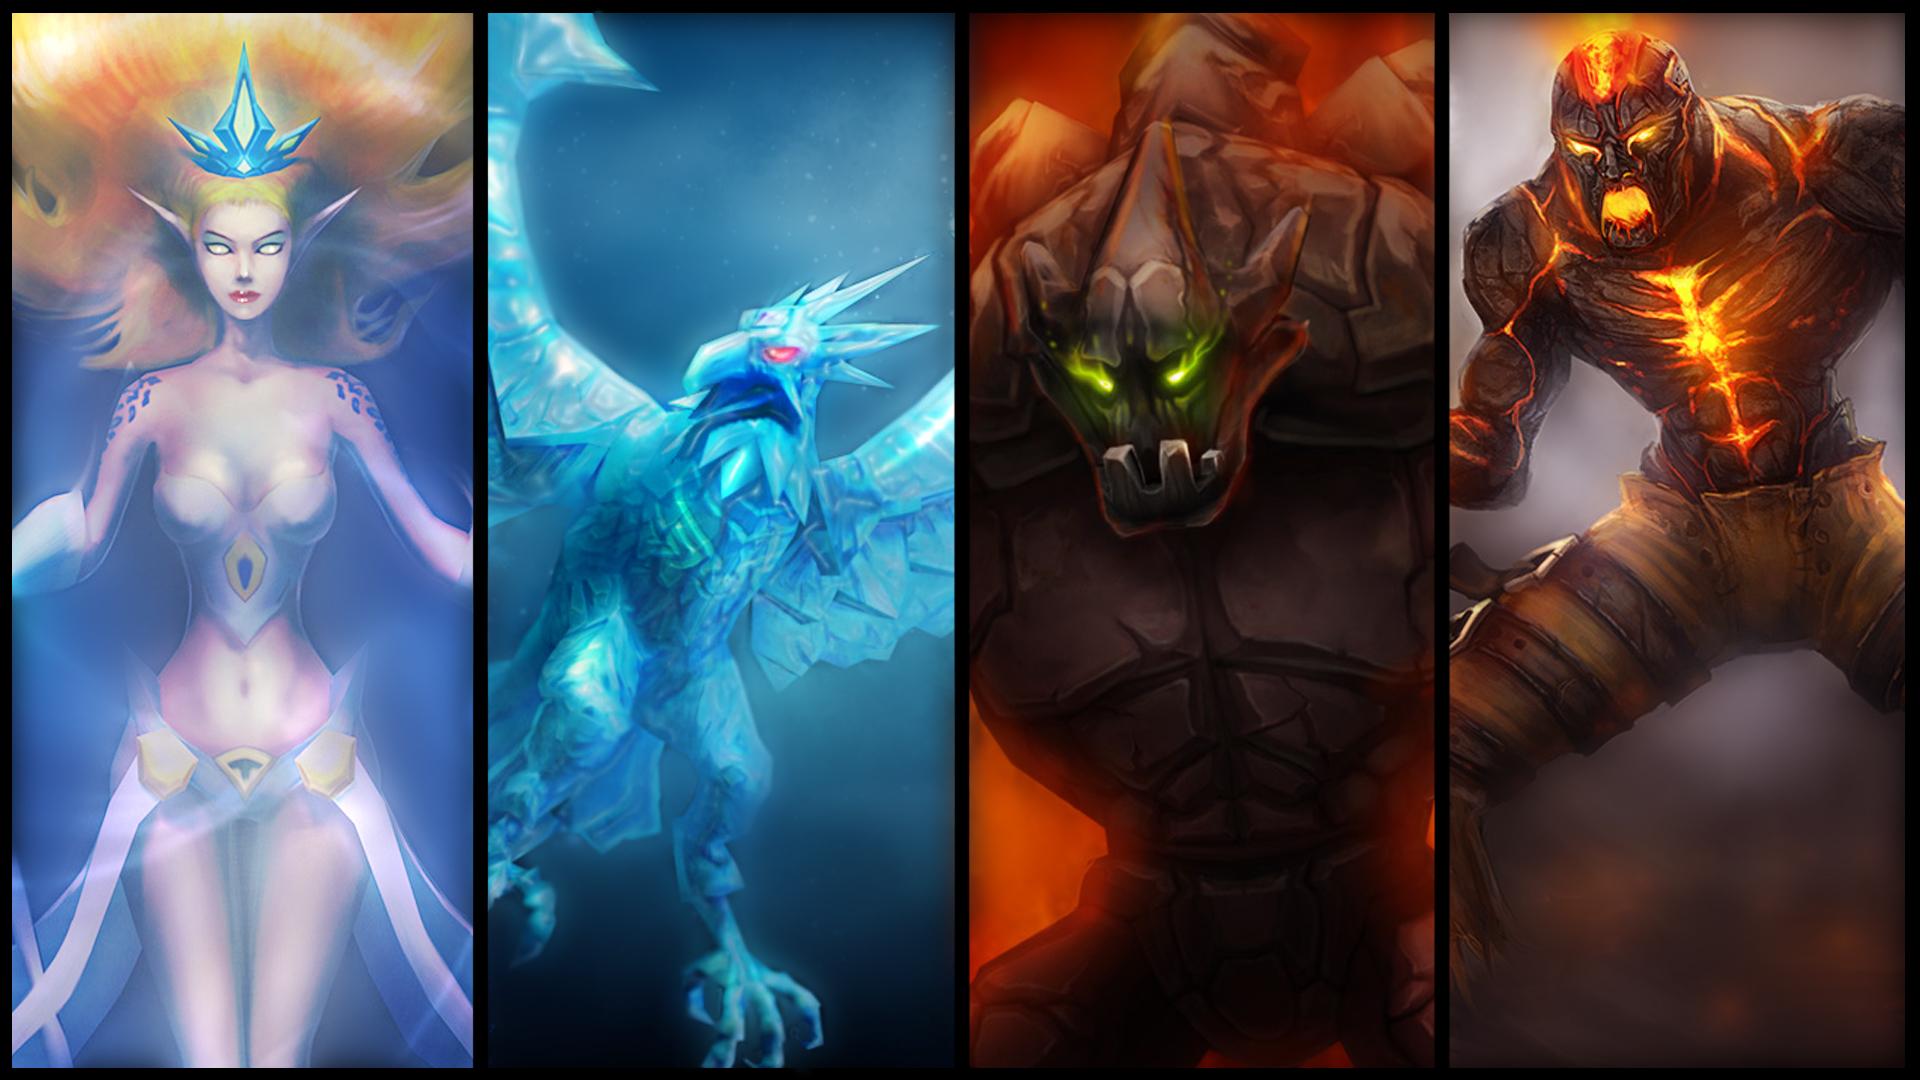 4 Elements Of Art : League of legends elements by tyrox on deviantart